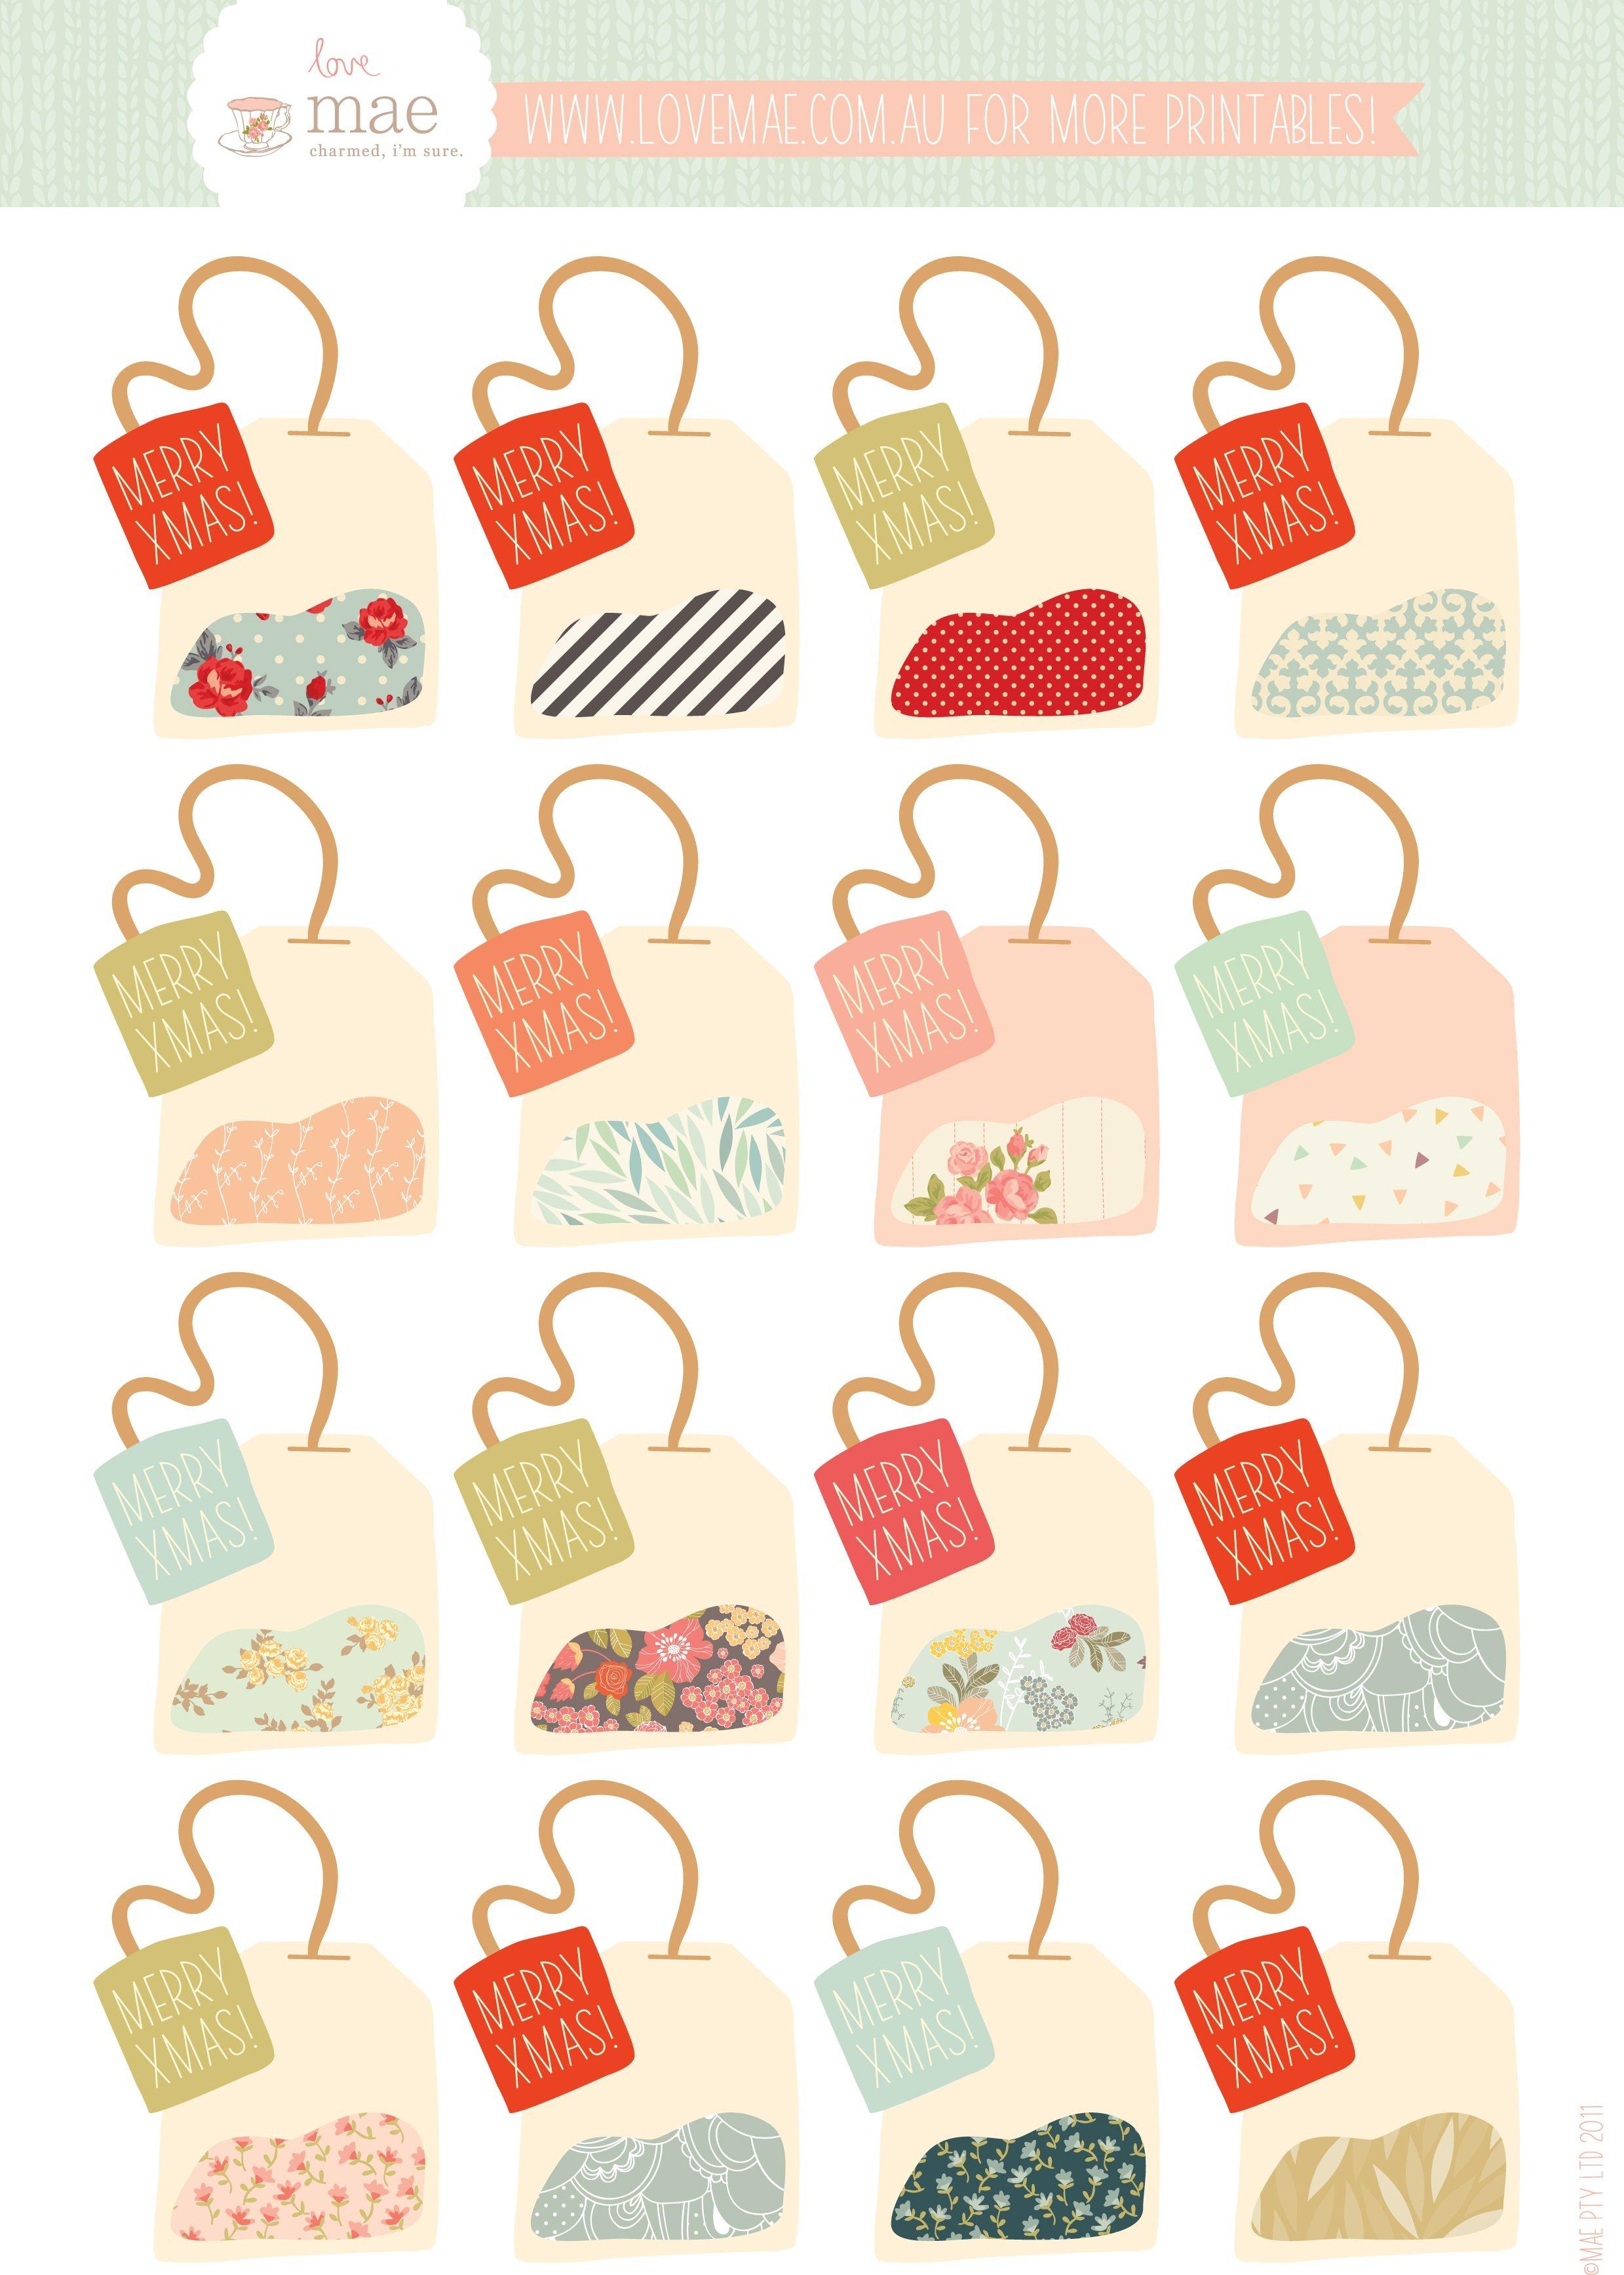 Free Printable Tea Bag Gift Tags (If Only It Didn't Say Xmas - Free Printable Gift Bag Tags